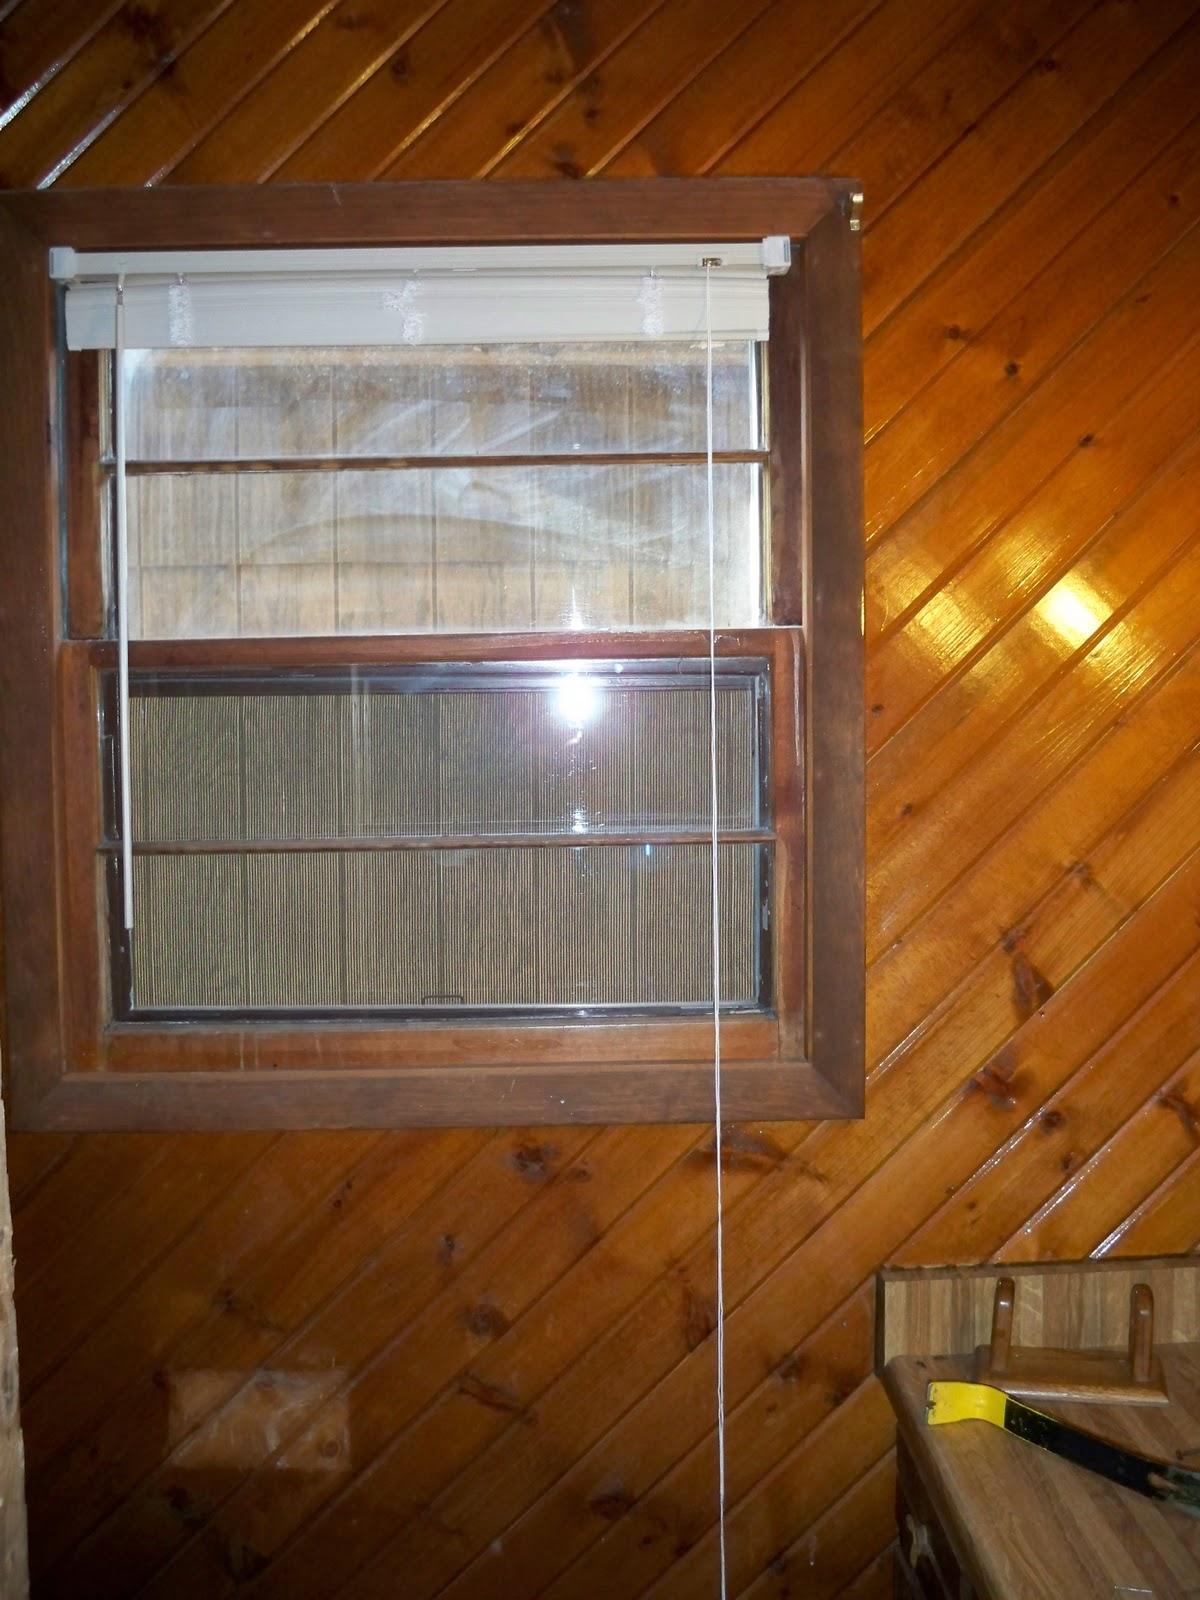 My Freezer is Full: December 2011